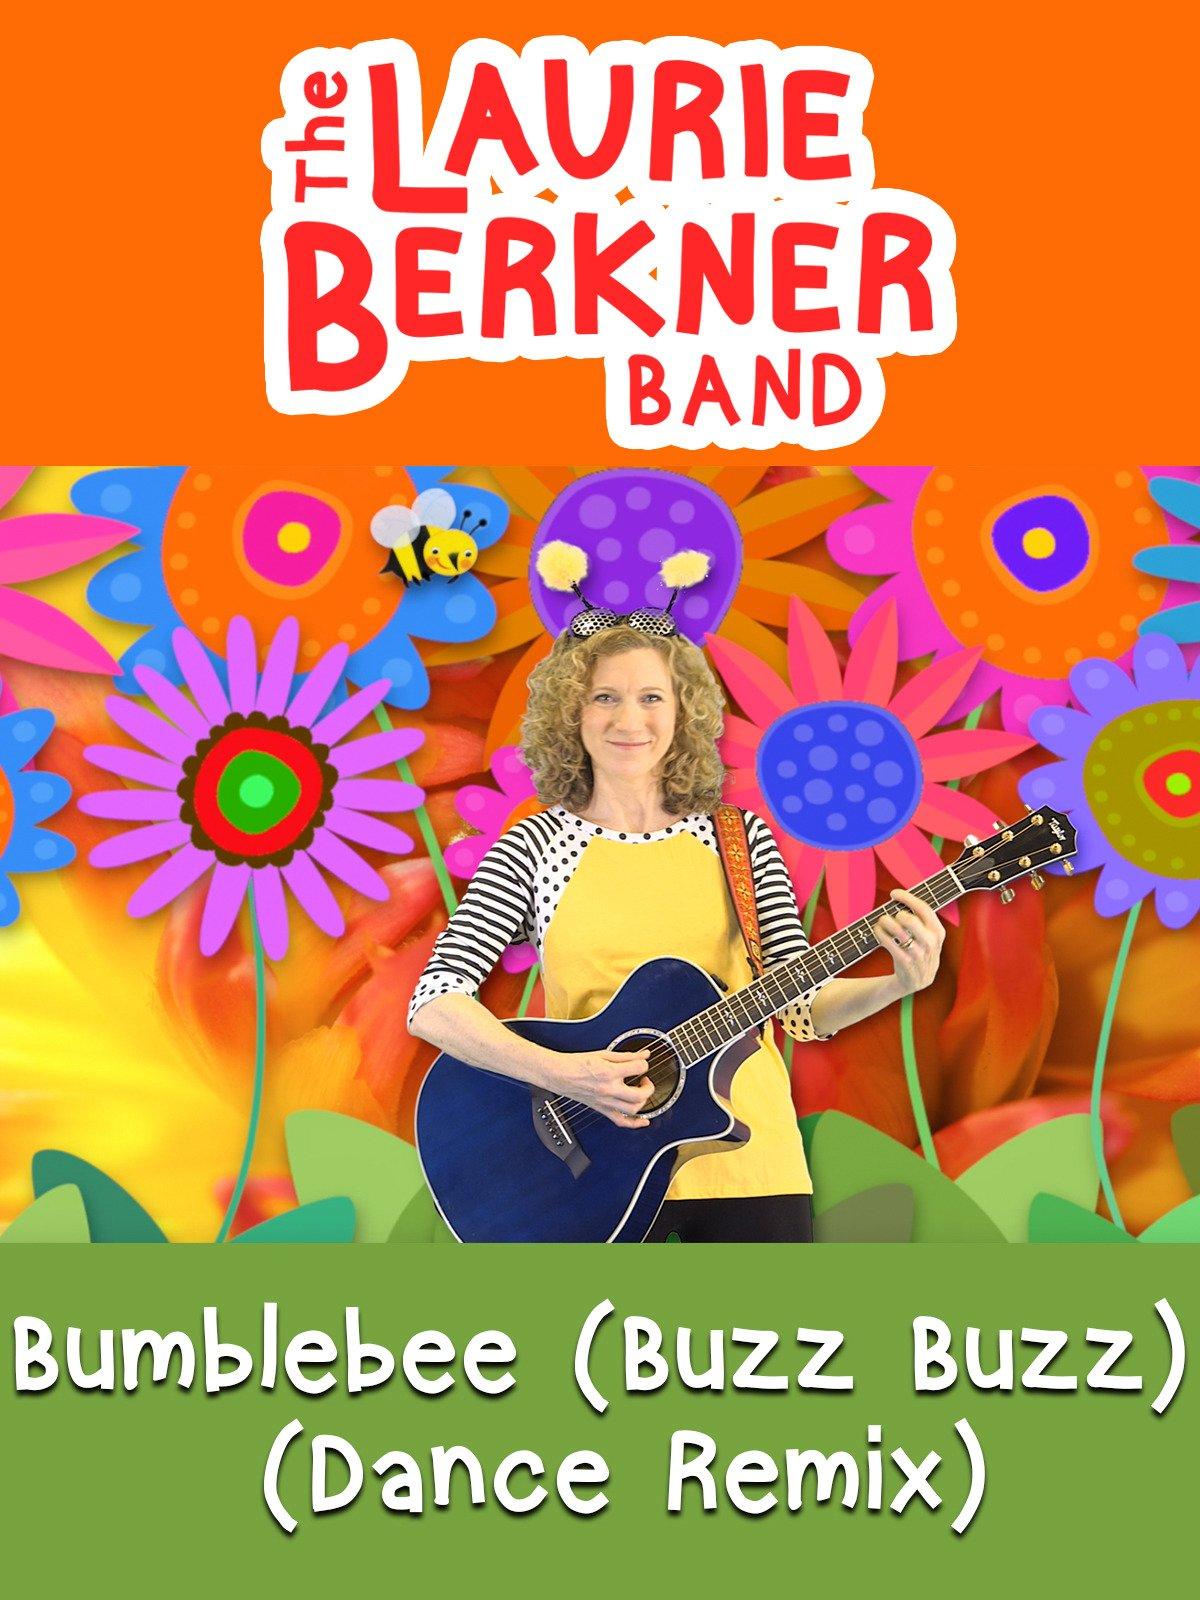 Bumblebee (Buzz Buzz) (Dance Remix)